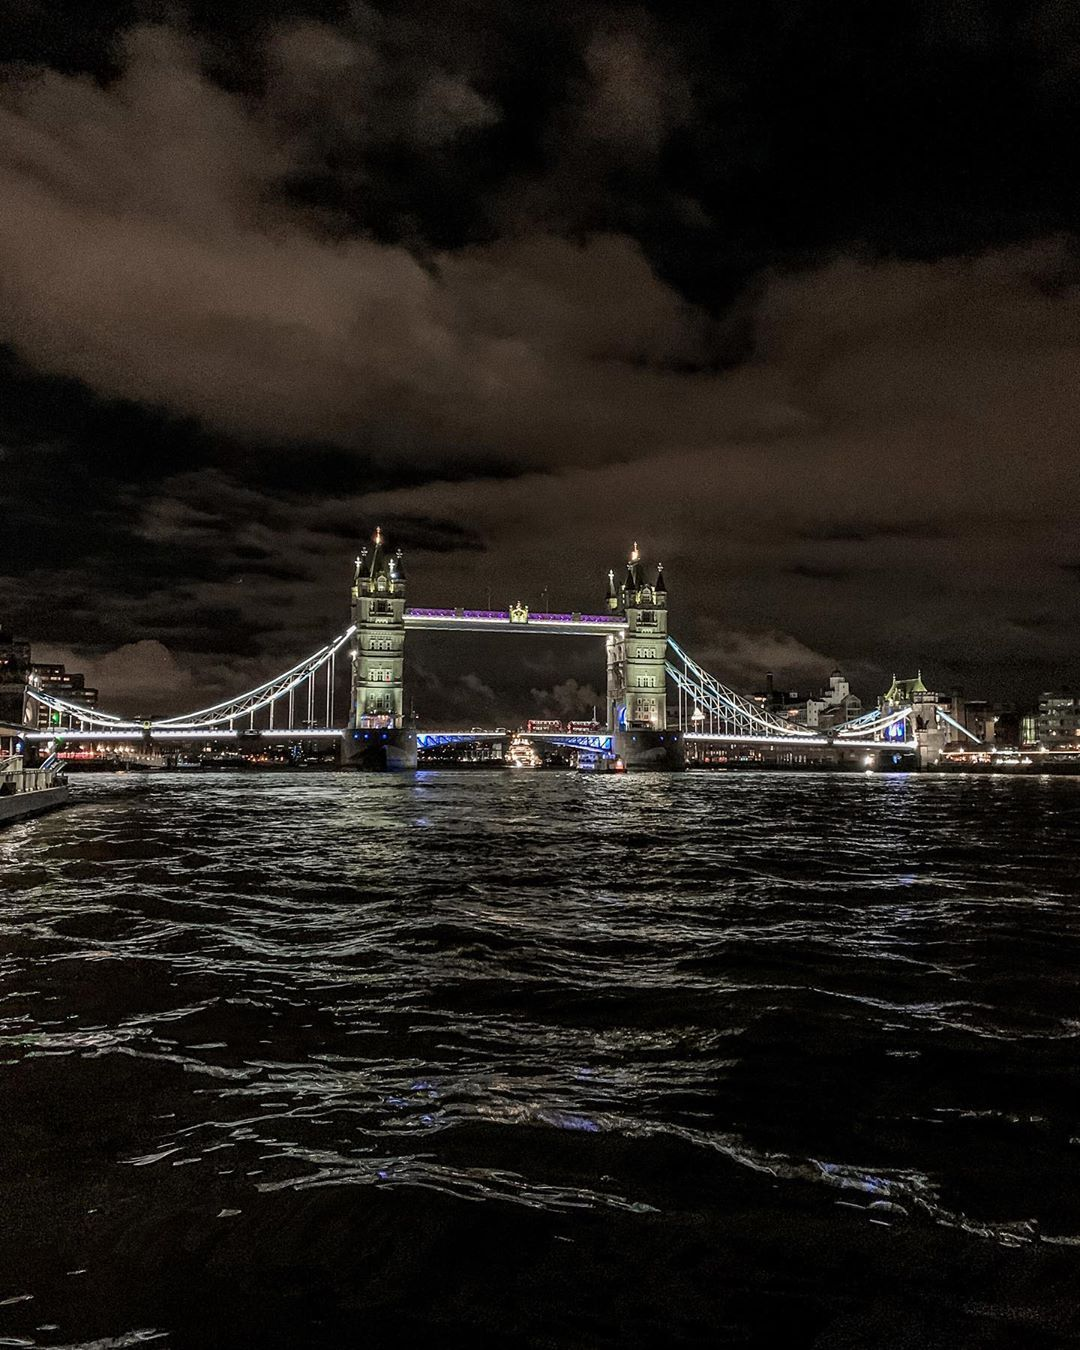 Tower Bridge #london #travelphotography #travel #towerbridge #travelgram #london #centrallondon #riverthames #boat #tourism #visitlondon #visitengland #england #capital #traveltheworld #goexplore #citybreak #london_city_photo #world_travel #explorepage #explore #shotoniphone #iphone #europe #europetravel